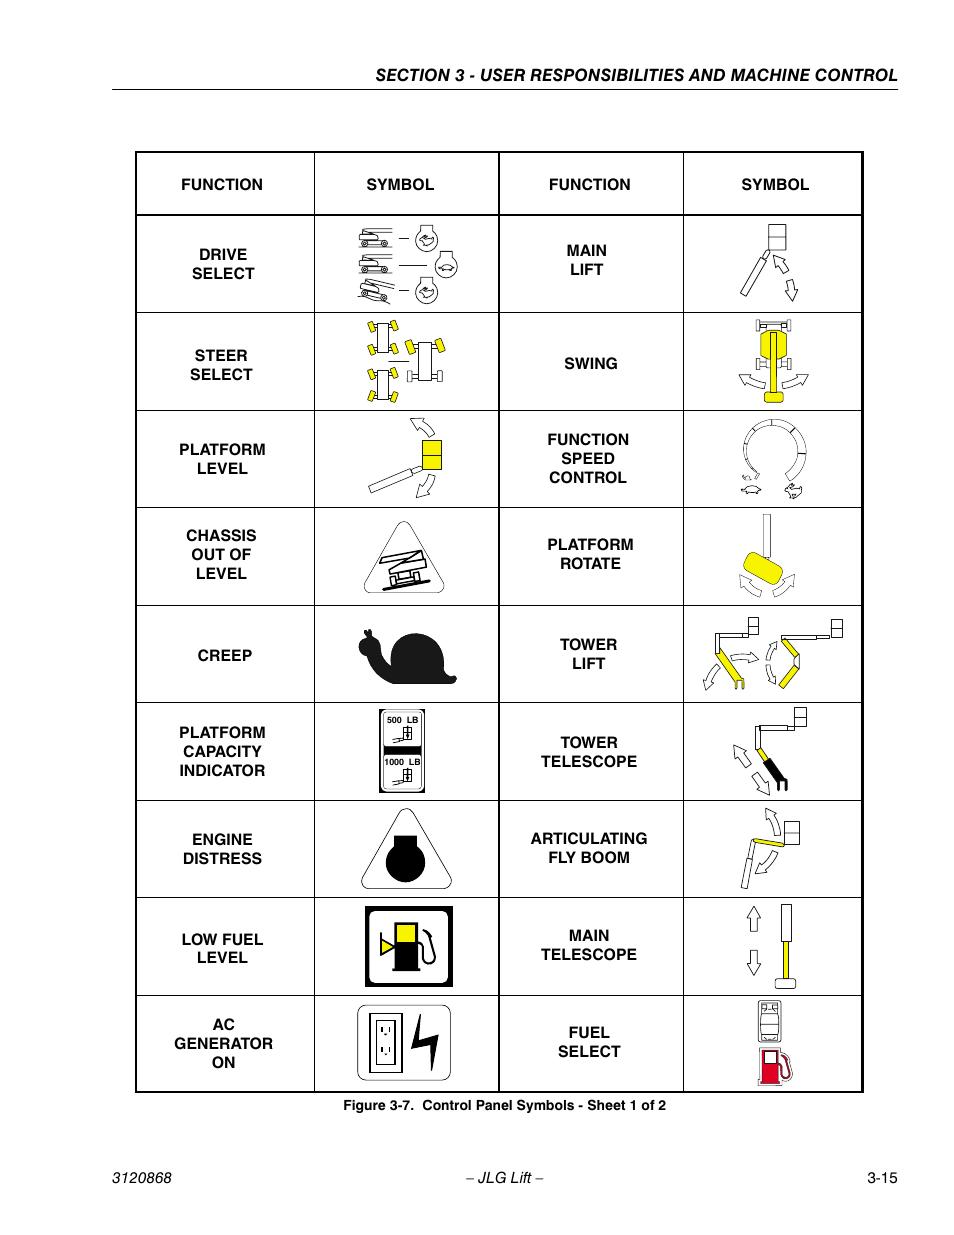 Db25 1205 Wiring Diagram - Auto Electrical Wiring Diagram ... Db Rj Wiring Diagram on